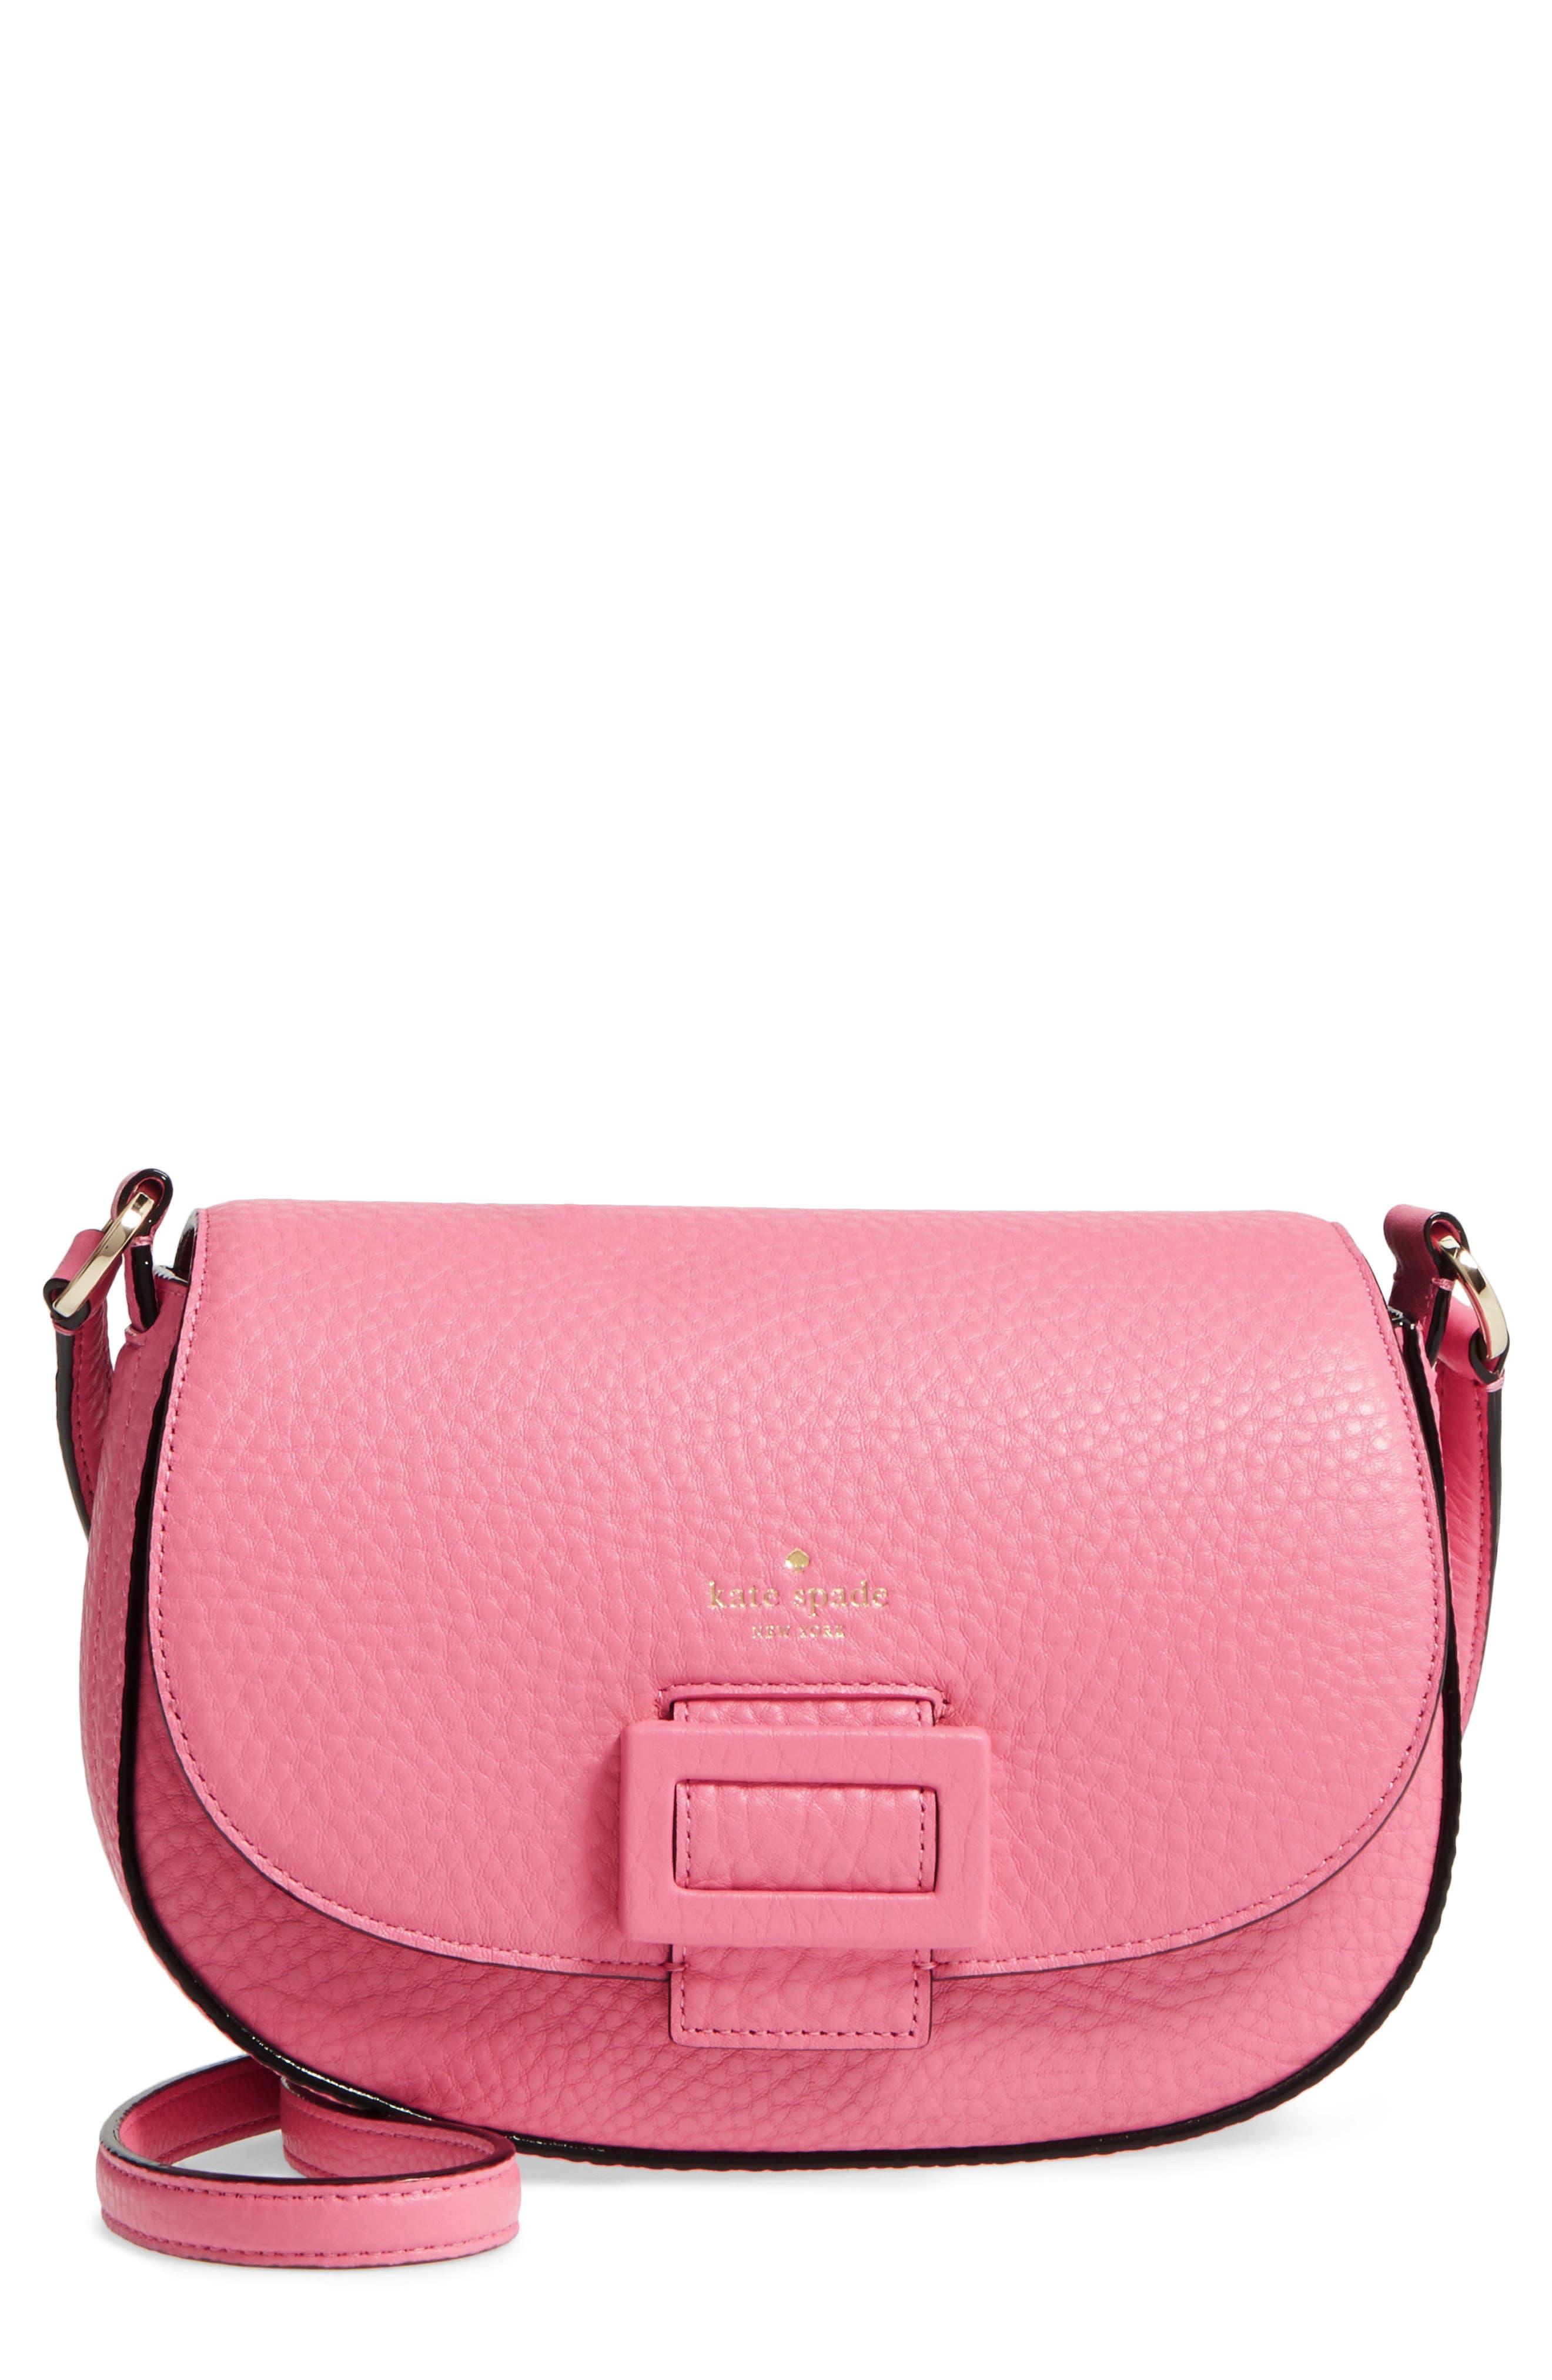 carlyle street - kallie leather saddle bag,                         Main,                         color, Pink Sunset